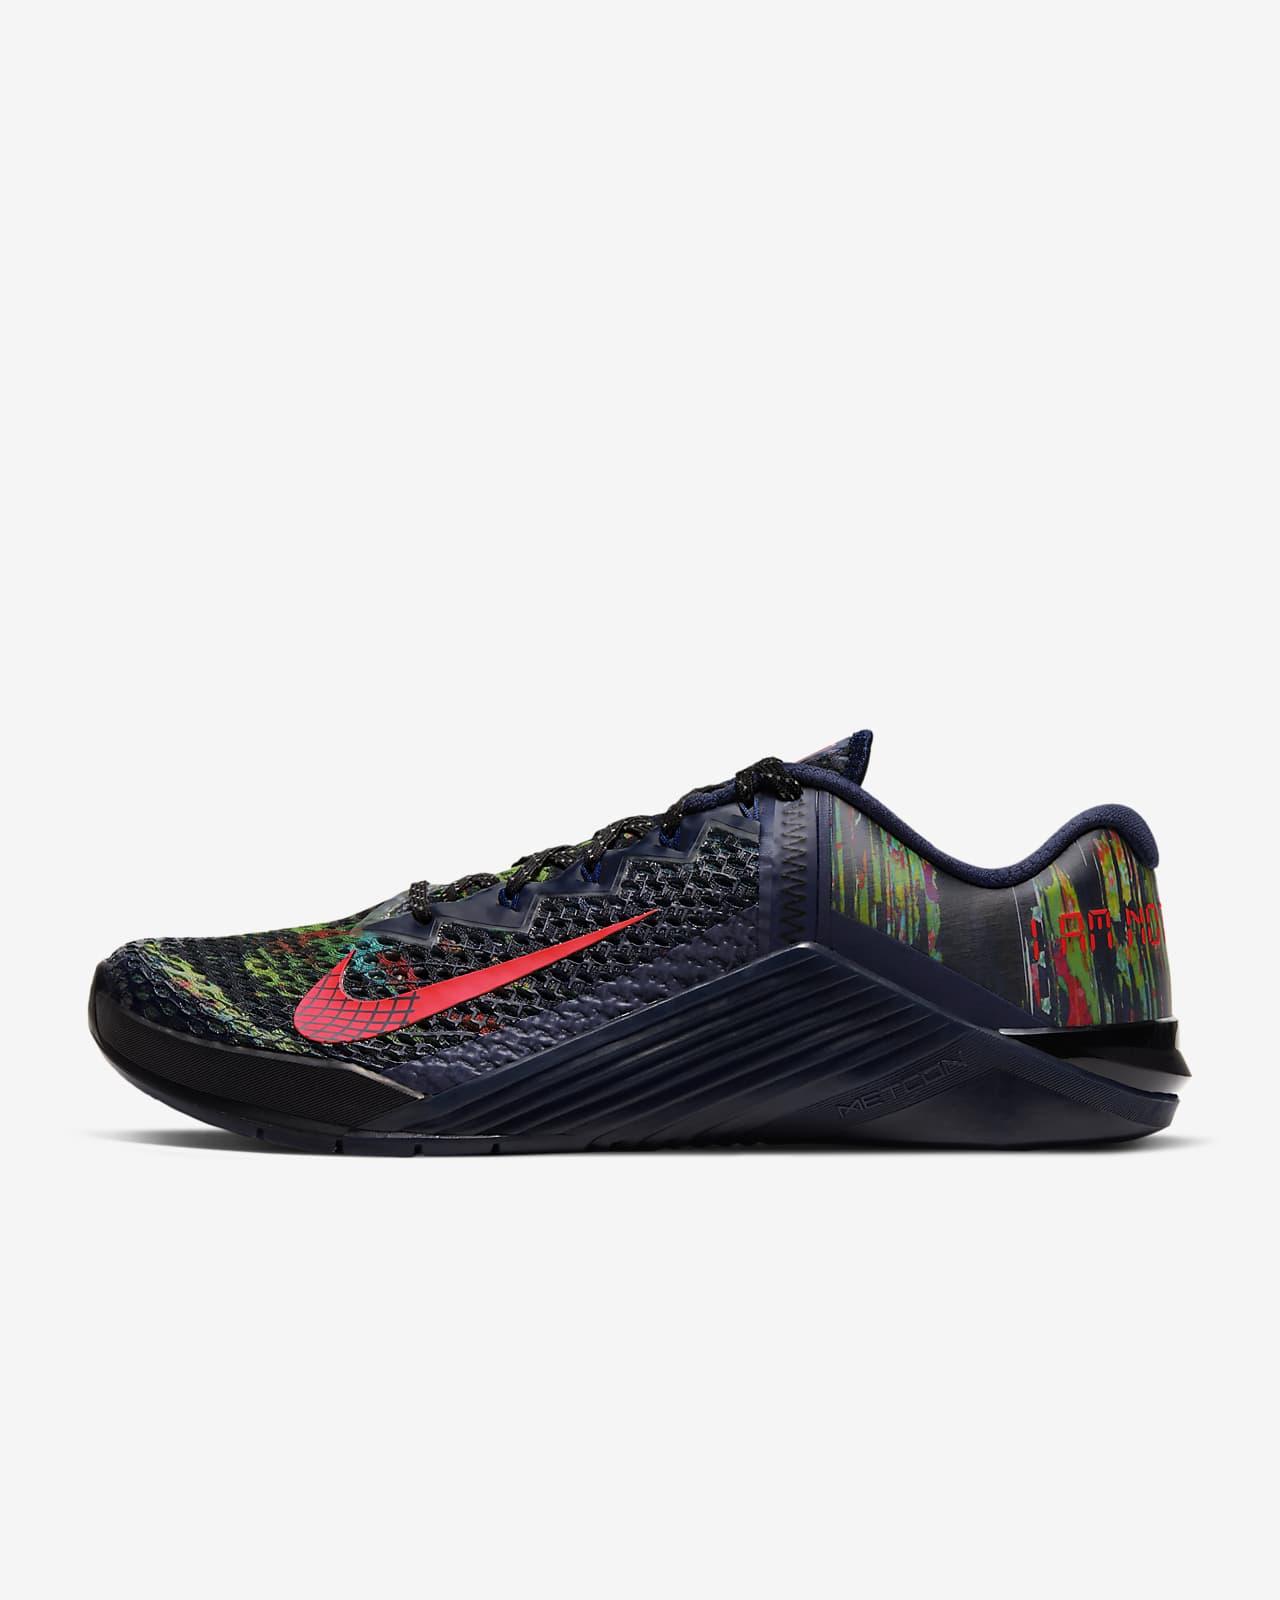 Pánská tréninková bota Nike Metcon6 AMP